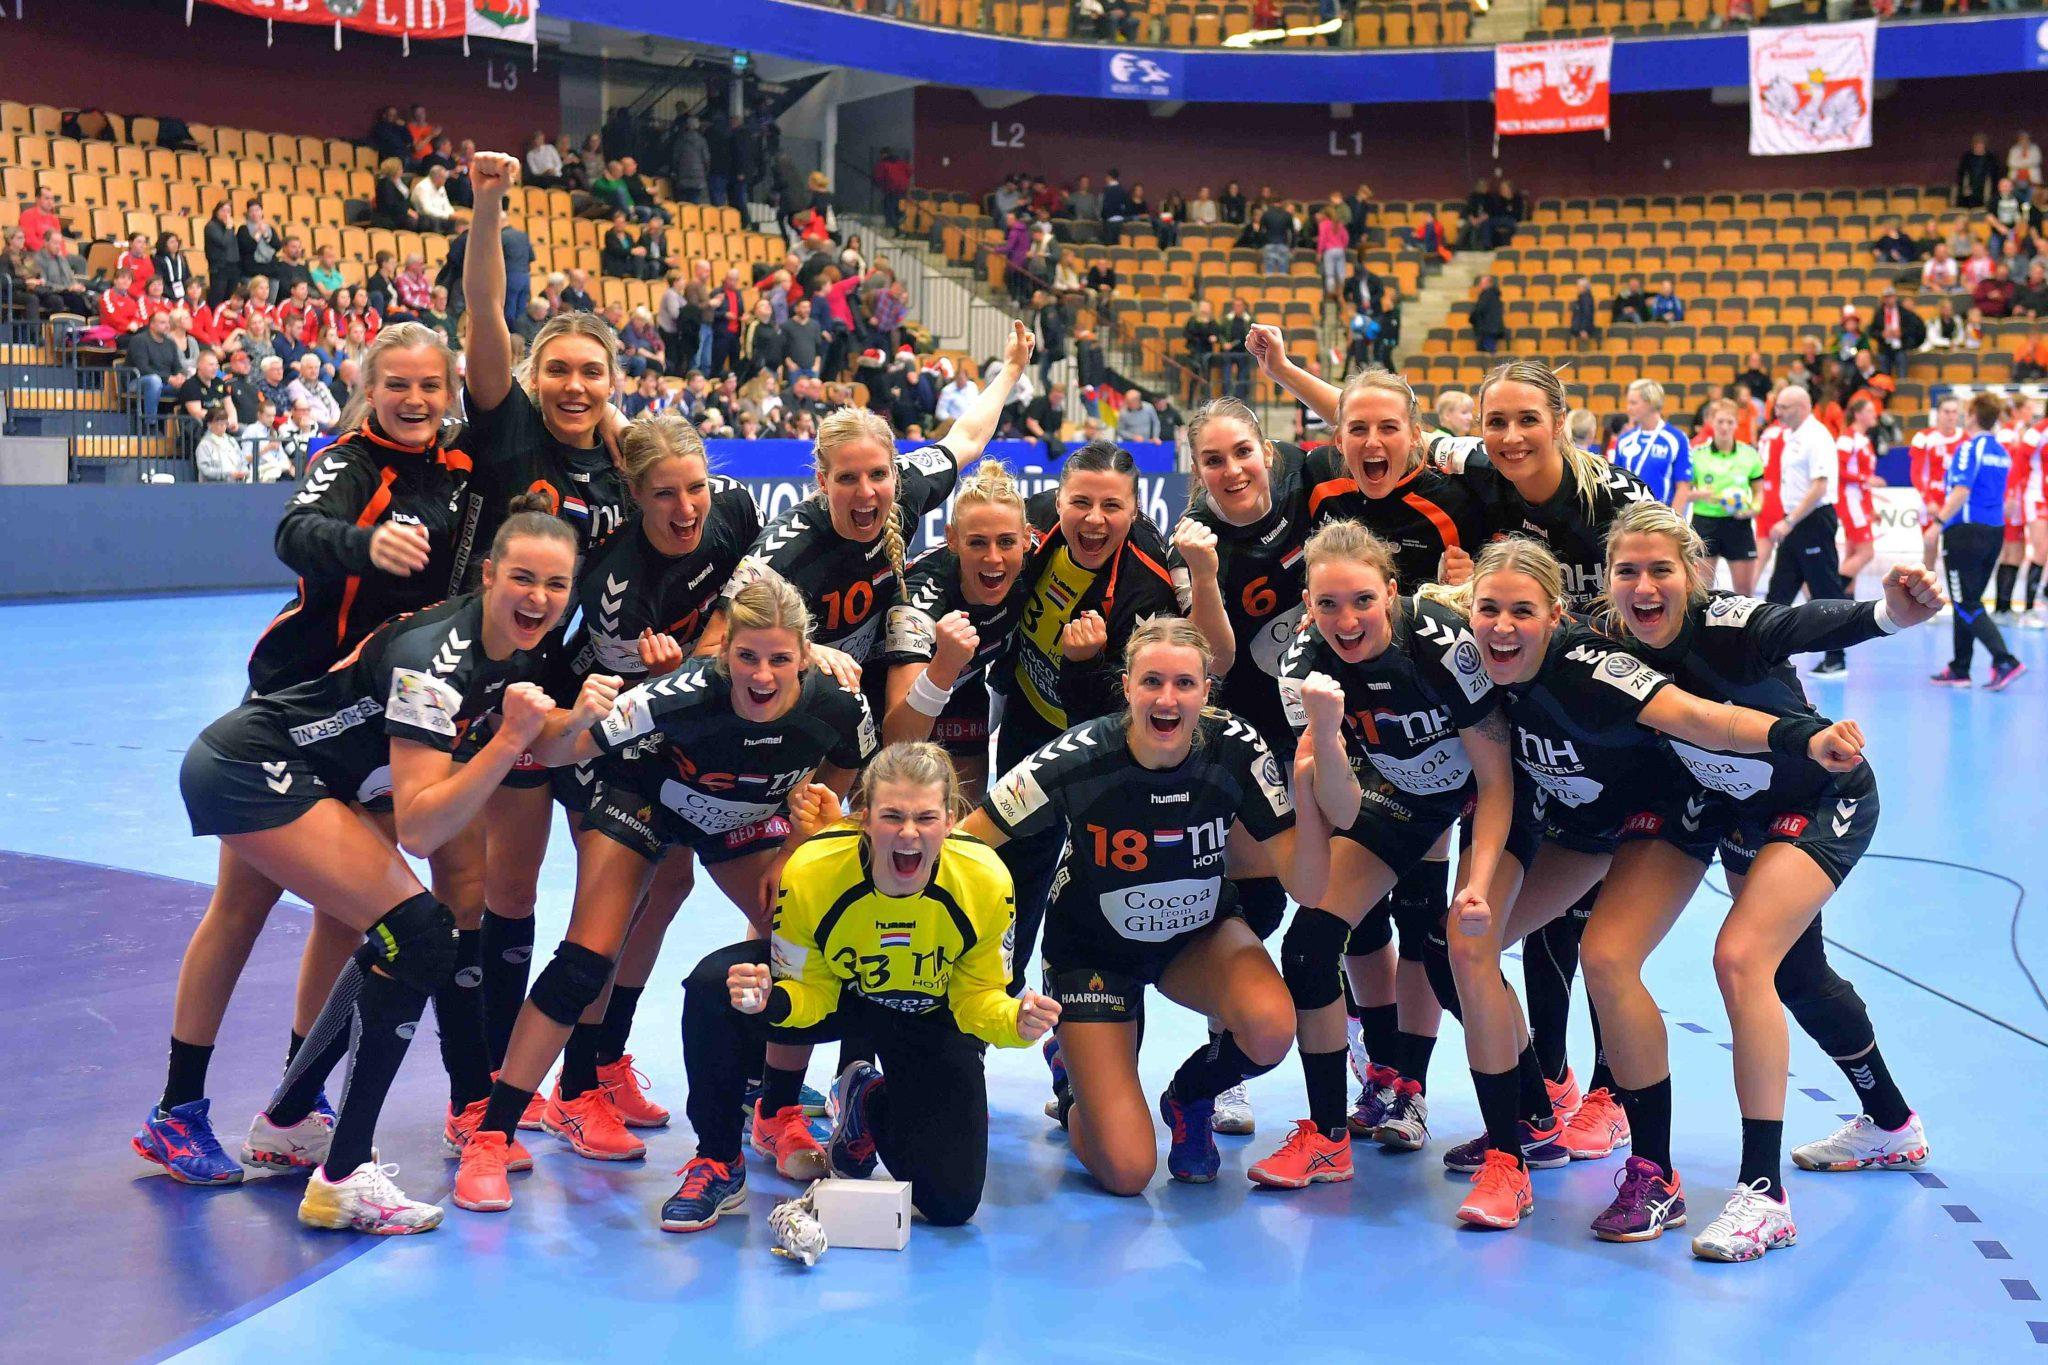 6-12-2016 HANDBAL:NEDERLAND-POLEN:KRISTIANSTAD Dames EK Handbal In Zweden, Groepsfase Nederland - Polen  Overwinningsfoto  Foto: Henk Seppen